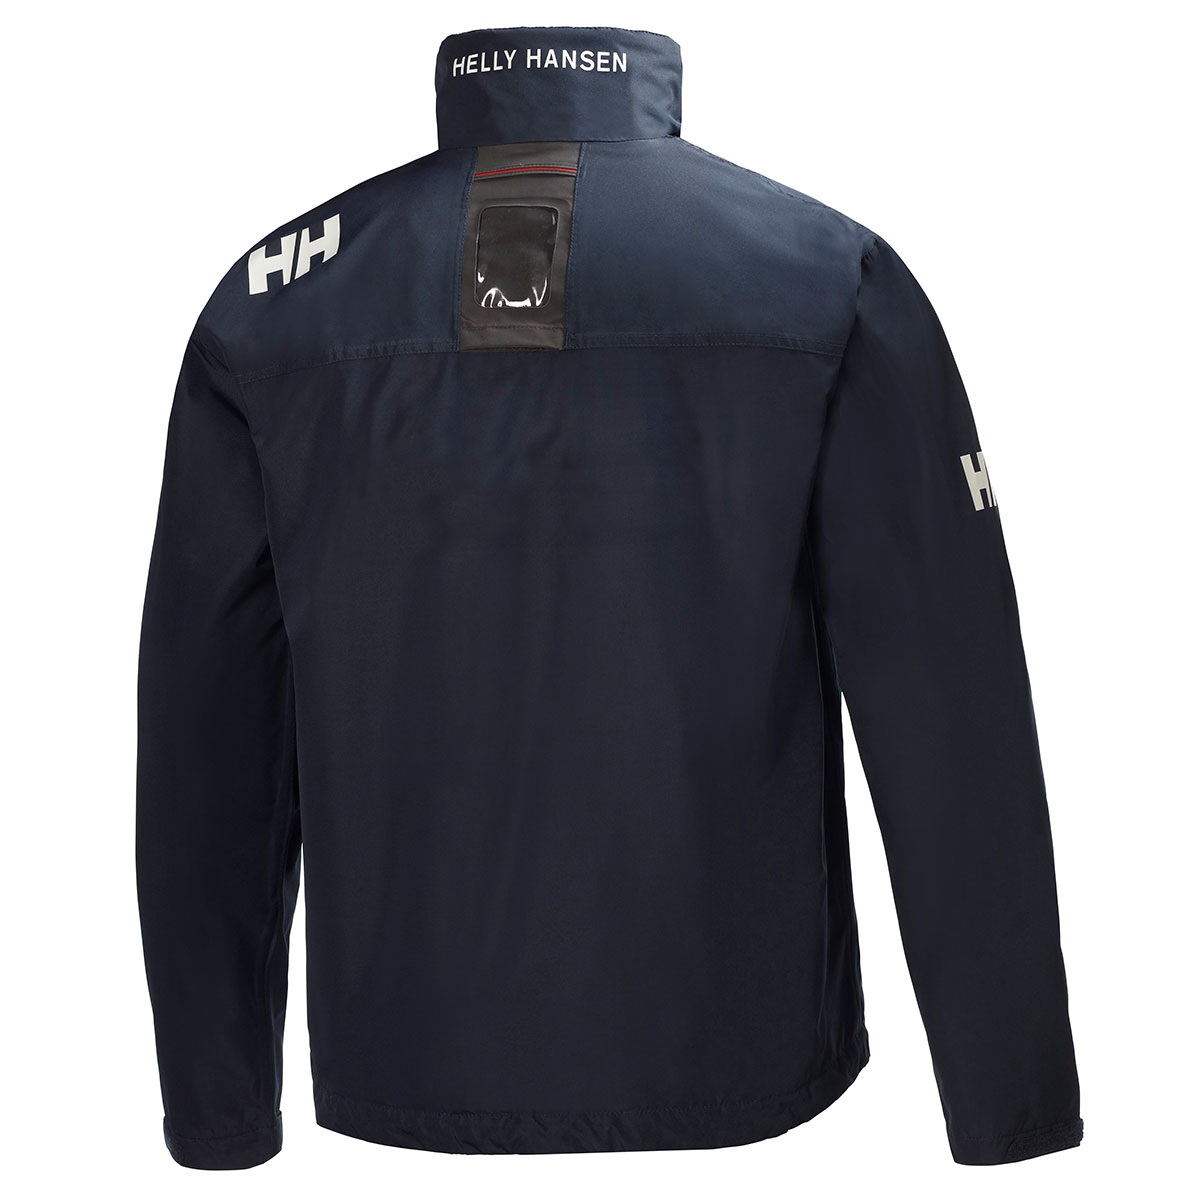 Helly-Hansen-Mens-2019-Crew-Midlayer-Waterproof-Windproof-Adjustable-Jacket thumbnail 11